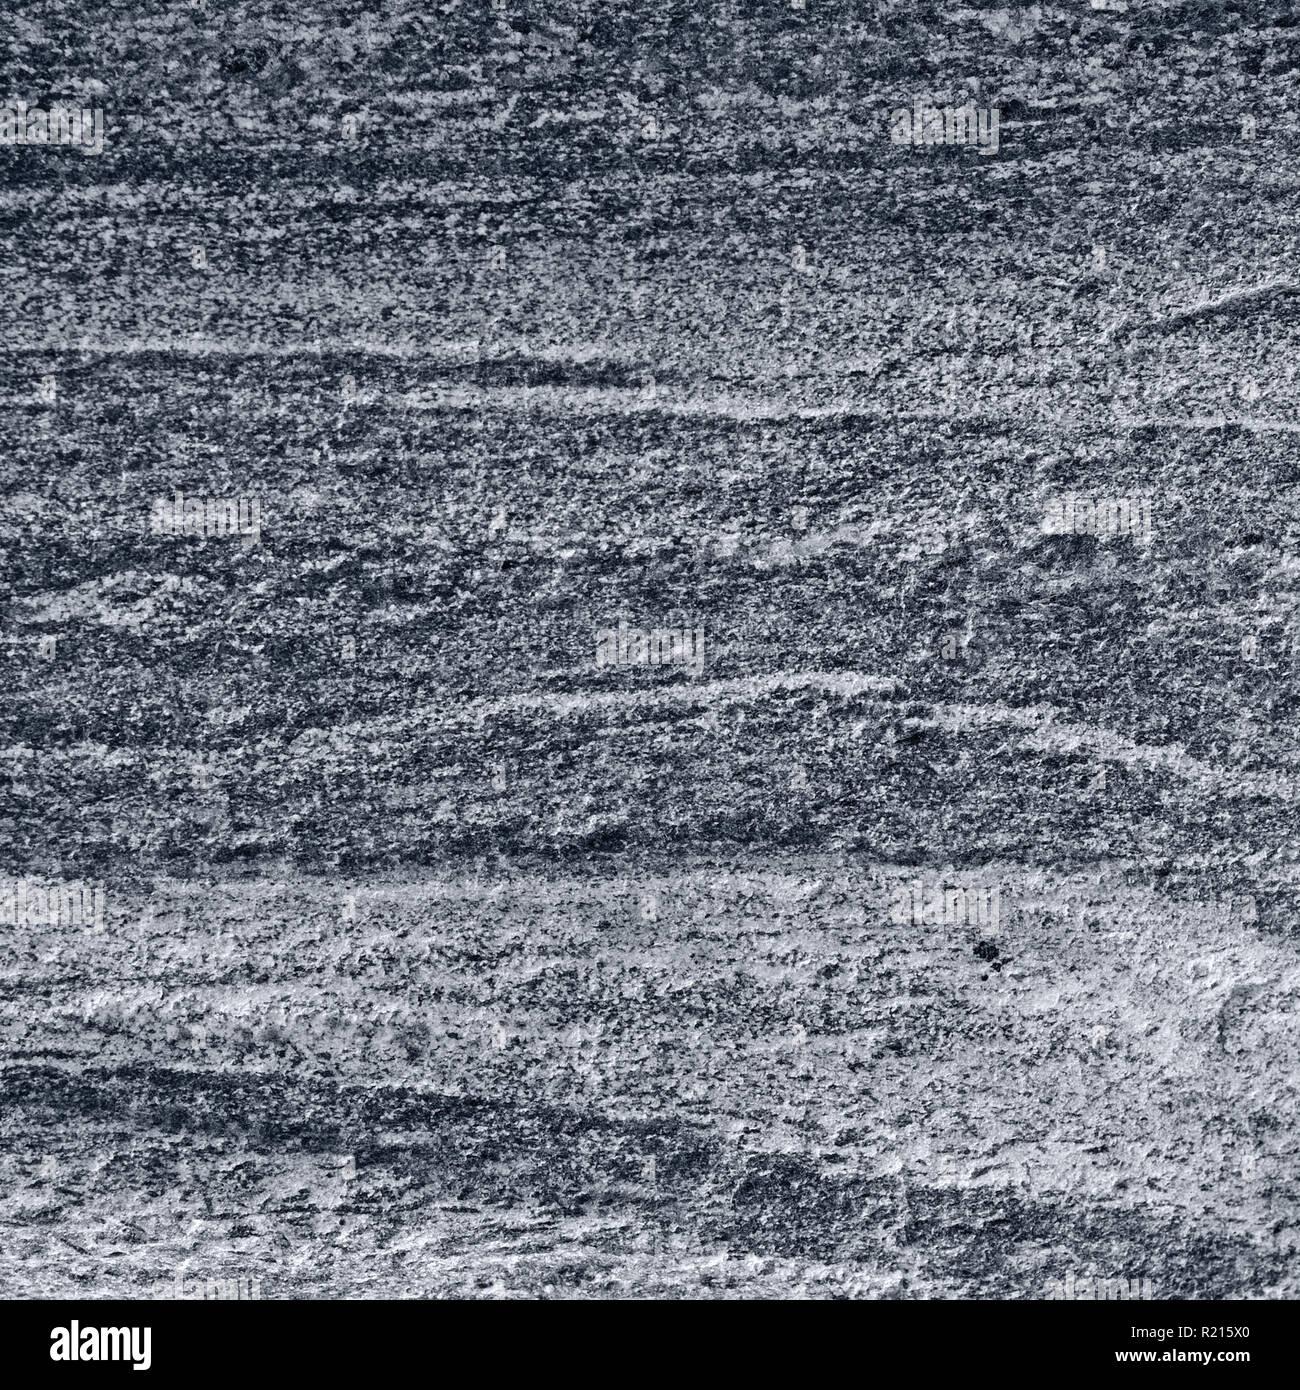 Migmatitic gneiss migmatite rock bands pattern, grey light dark banded granite texture macro closeup, large detailed textured silver gray horizontal Stock Photo